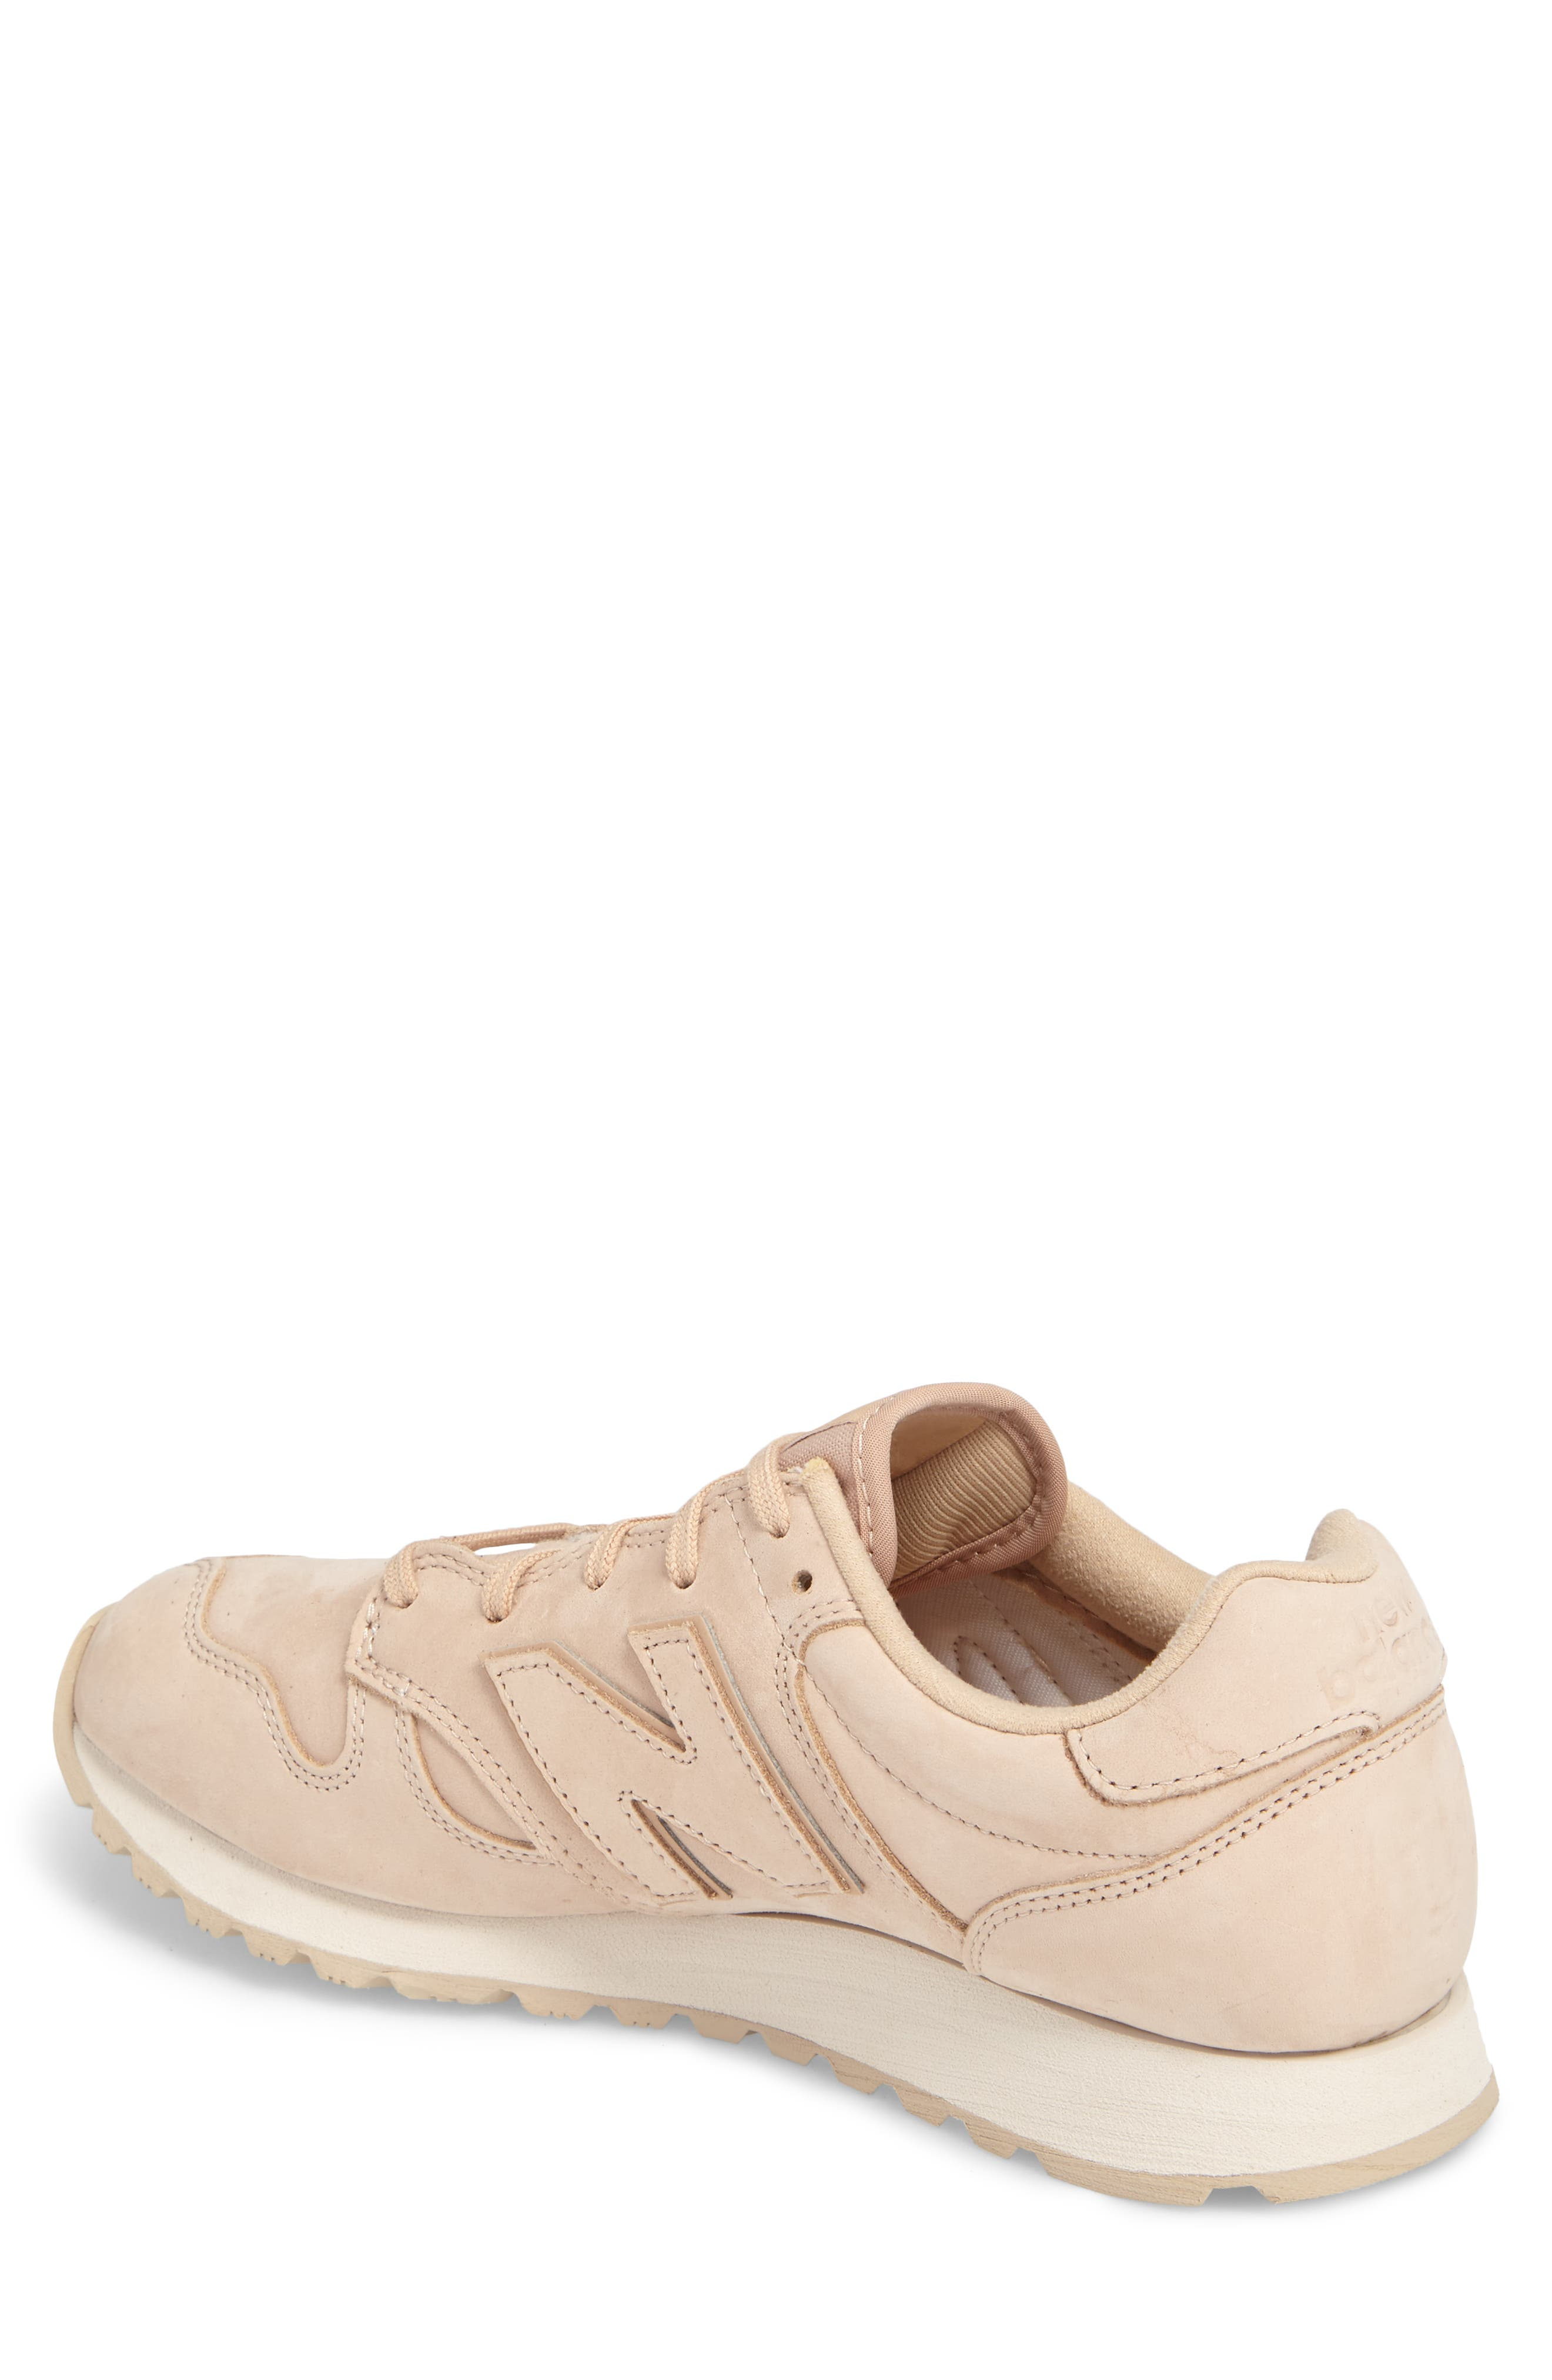 U520 Trainer Sneaker,                             Alternate thumbnail 4, color,